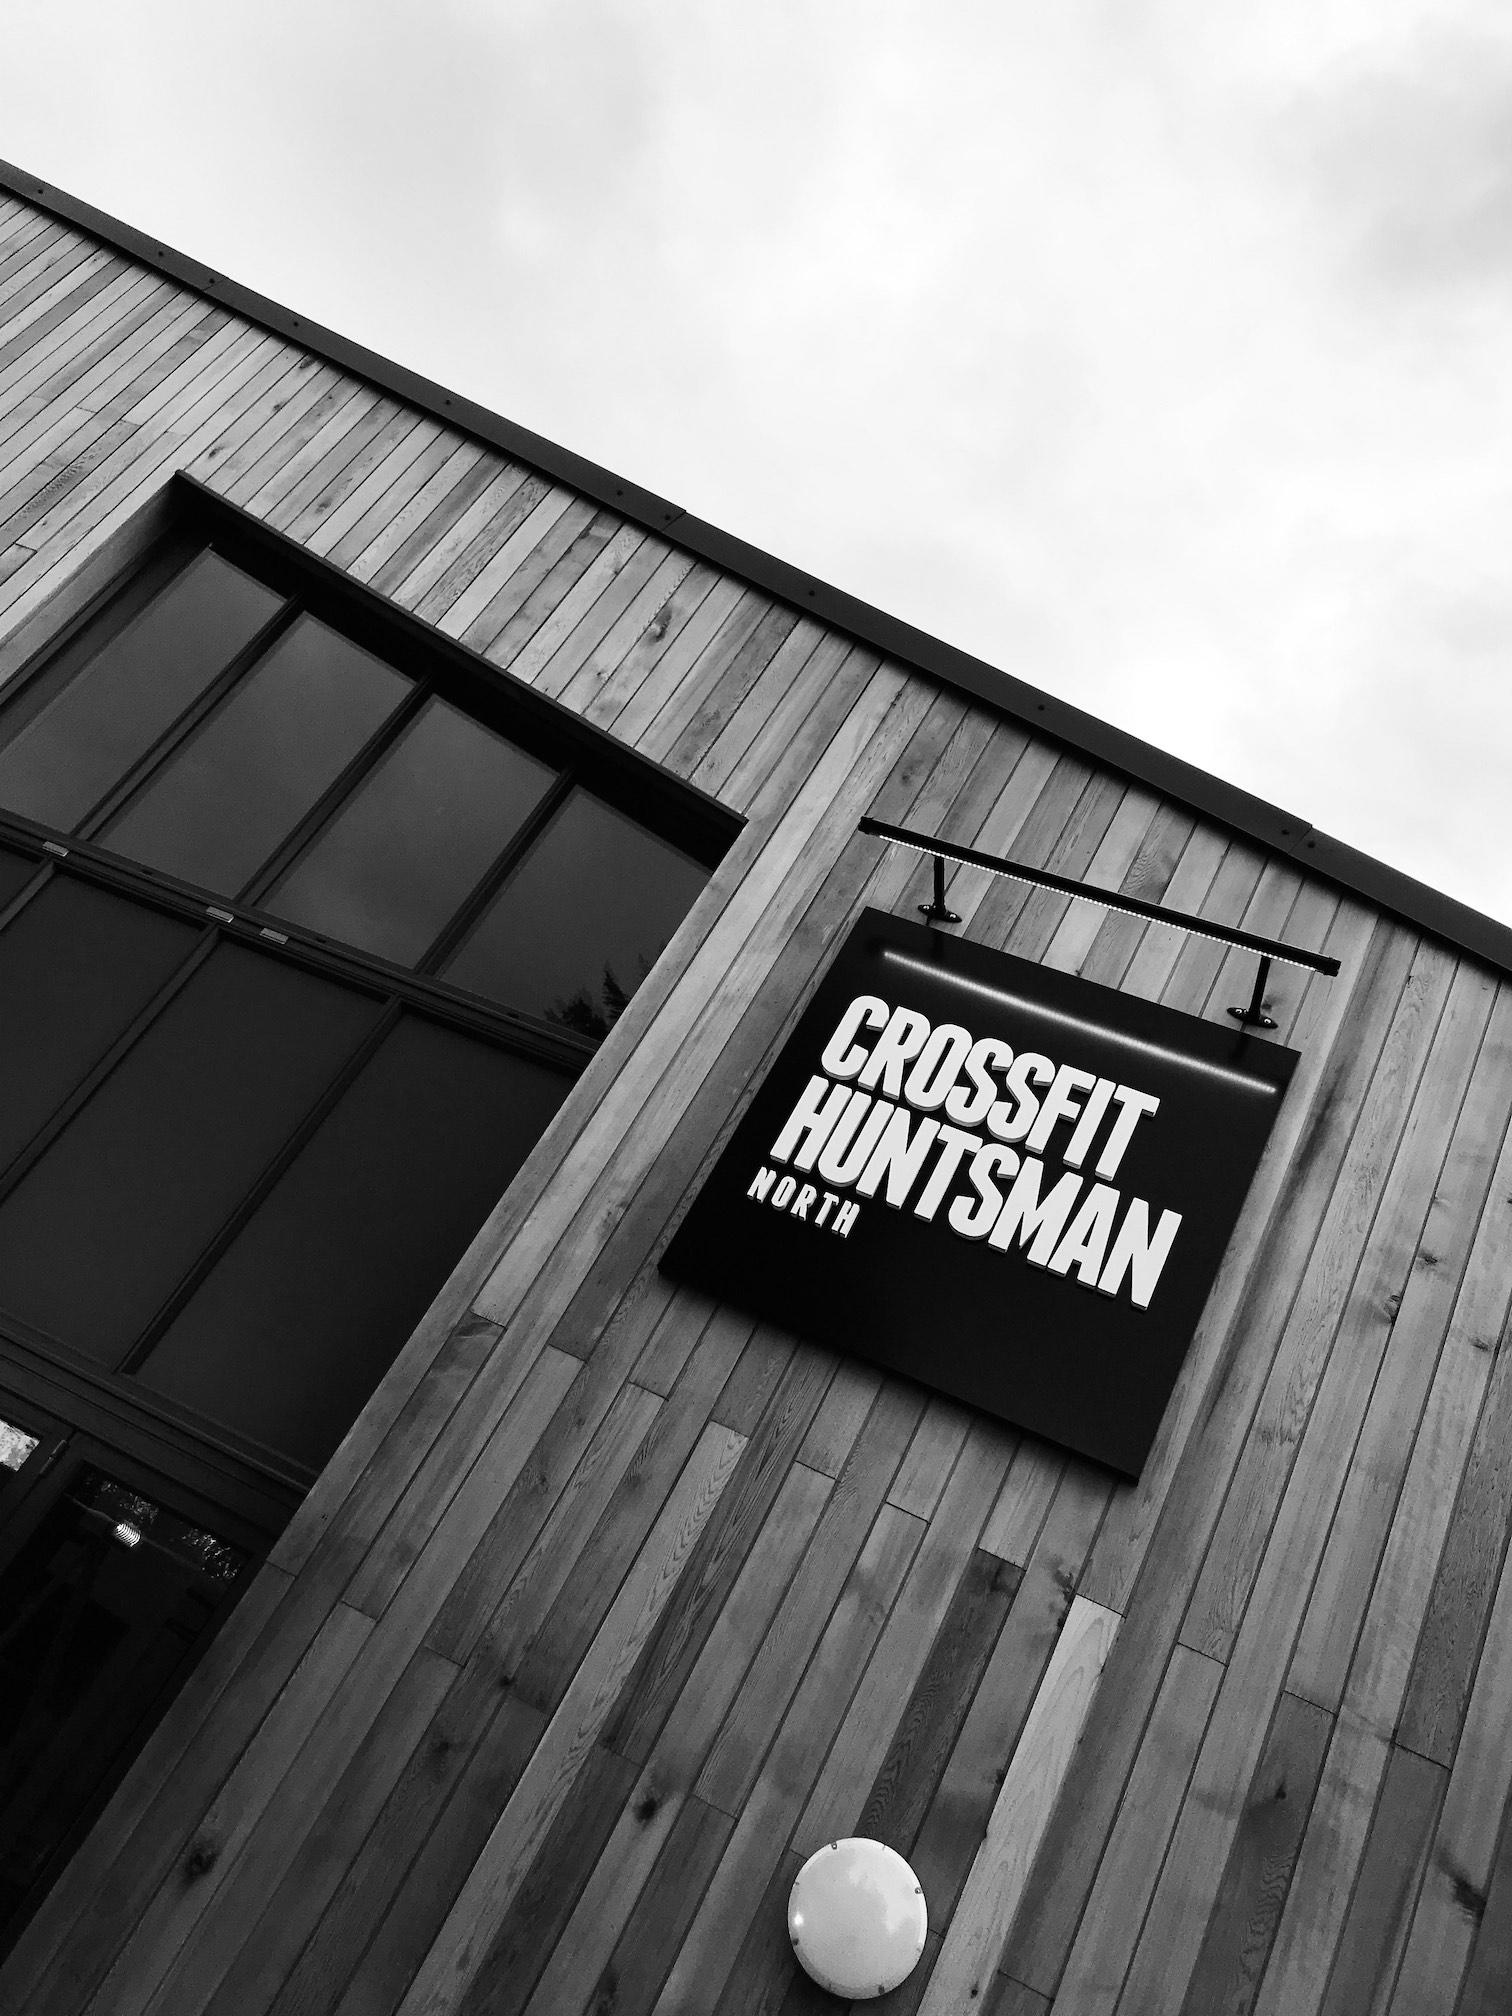 Huntsman North (Bishop's Stortford) - WE ARE OPEN!